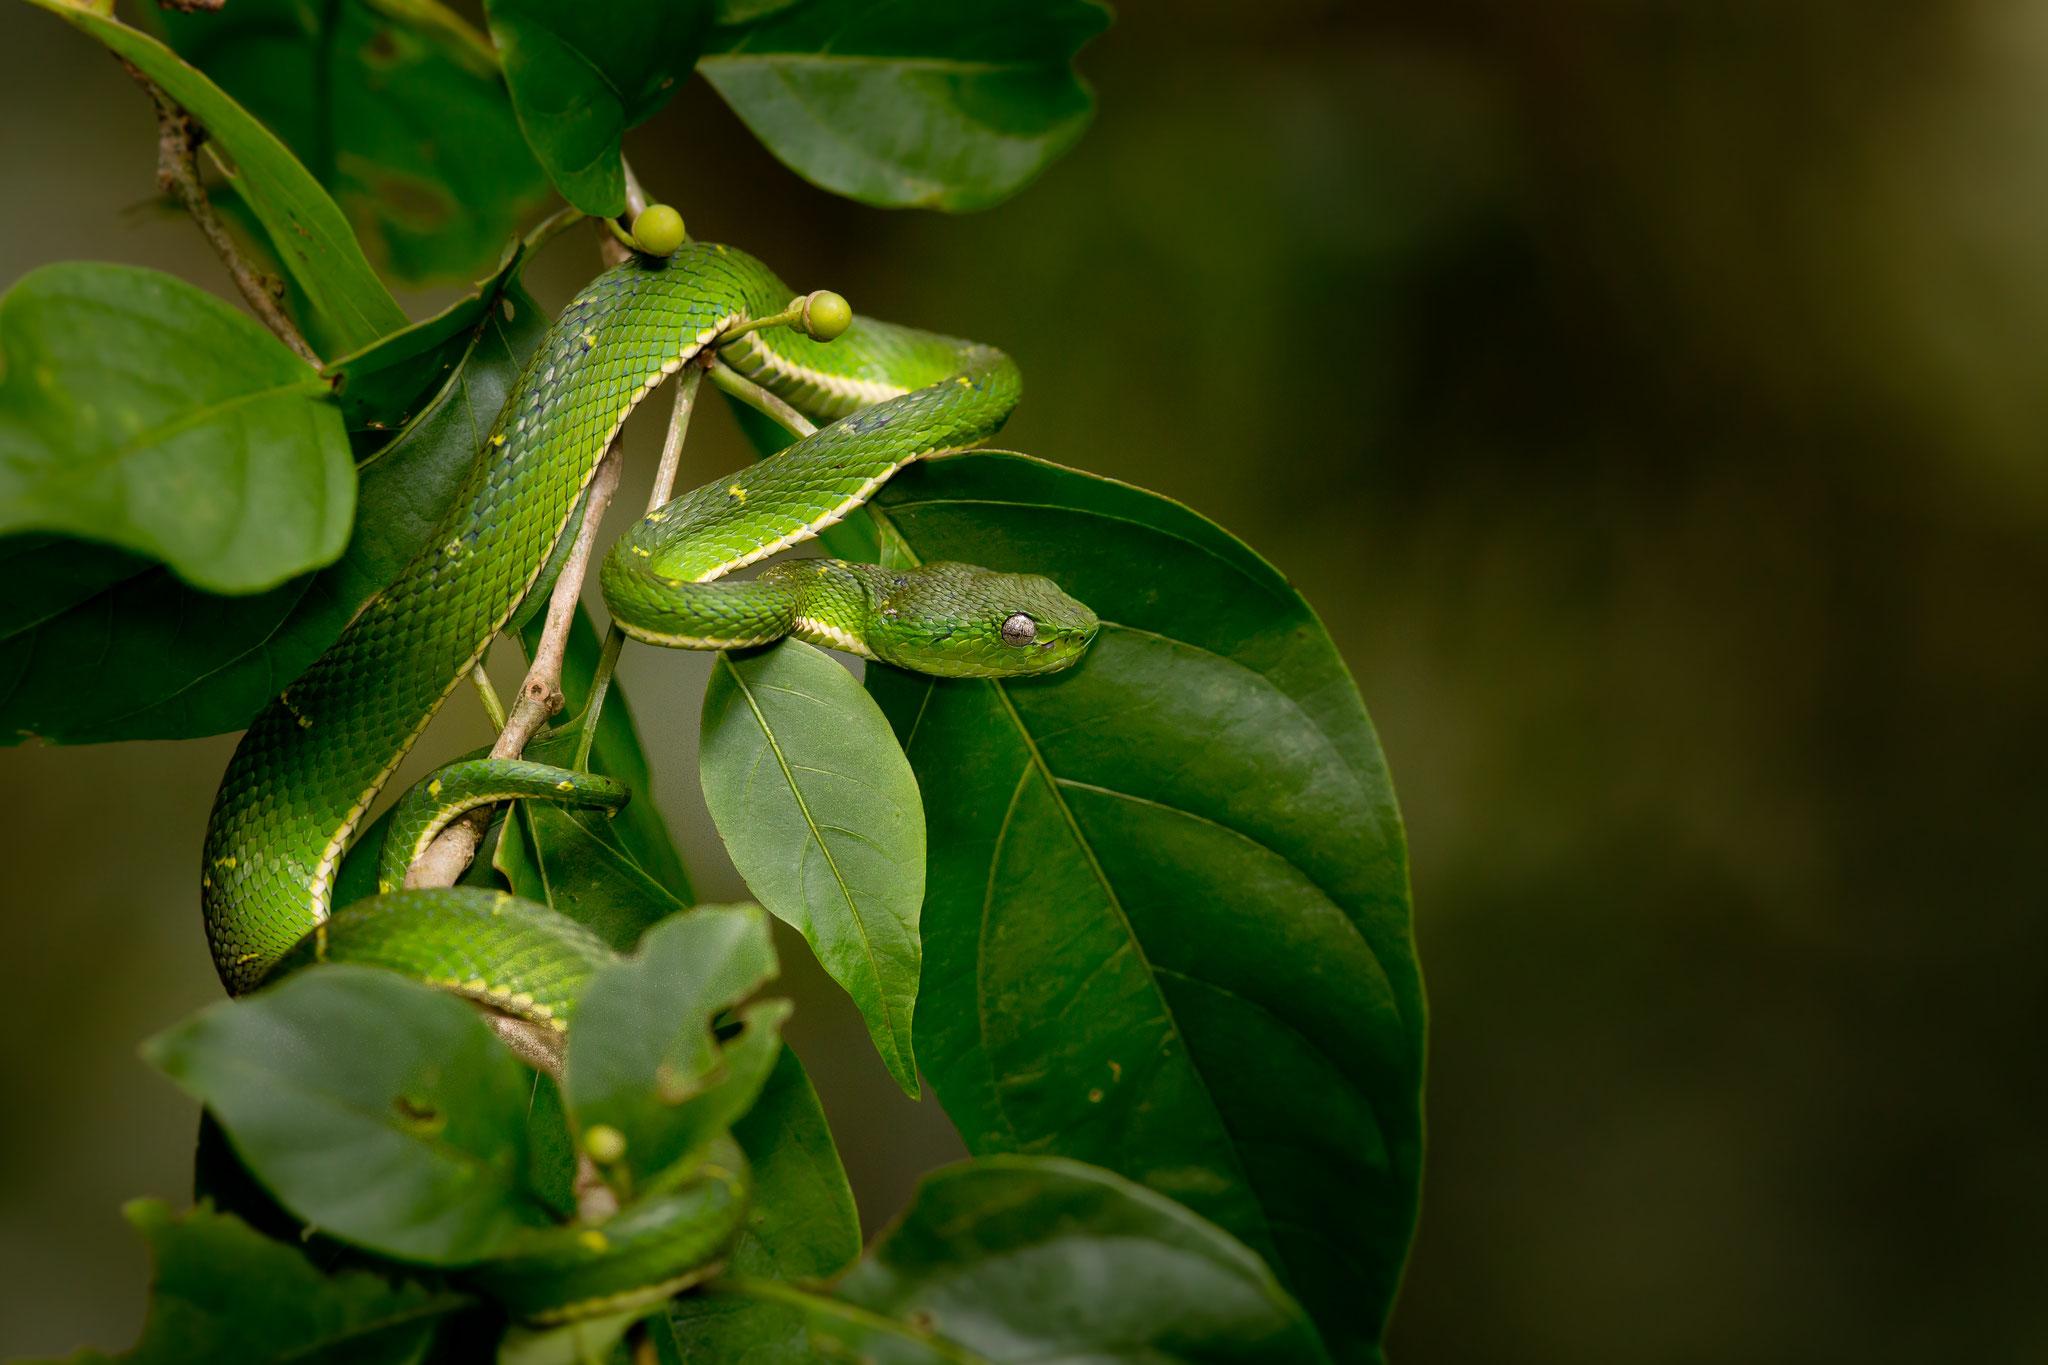 Bothriechis lateralis Costa Rica @Pascal Jahan